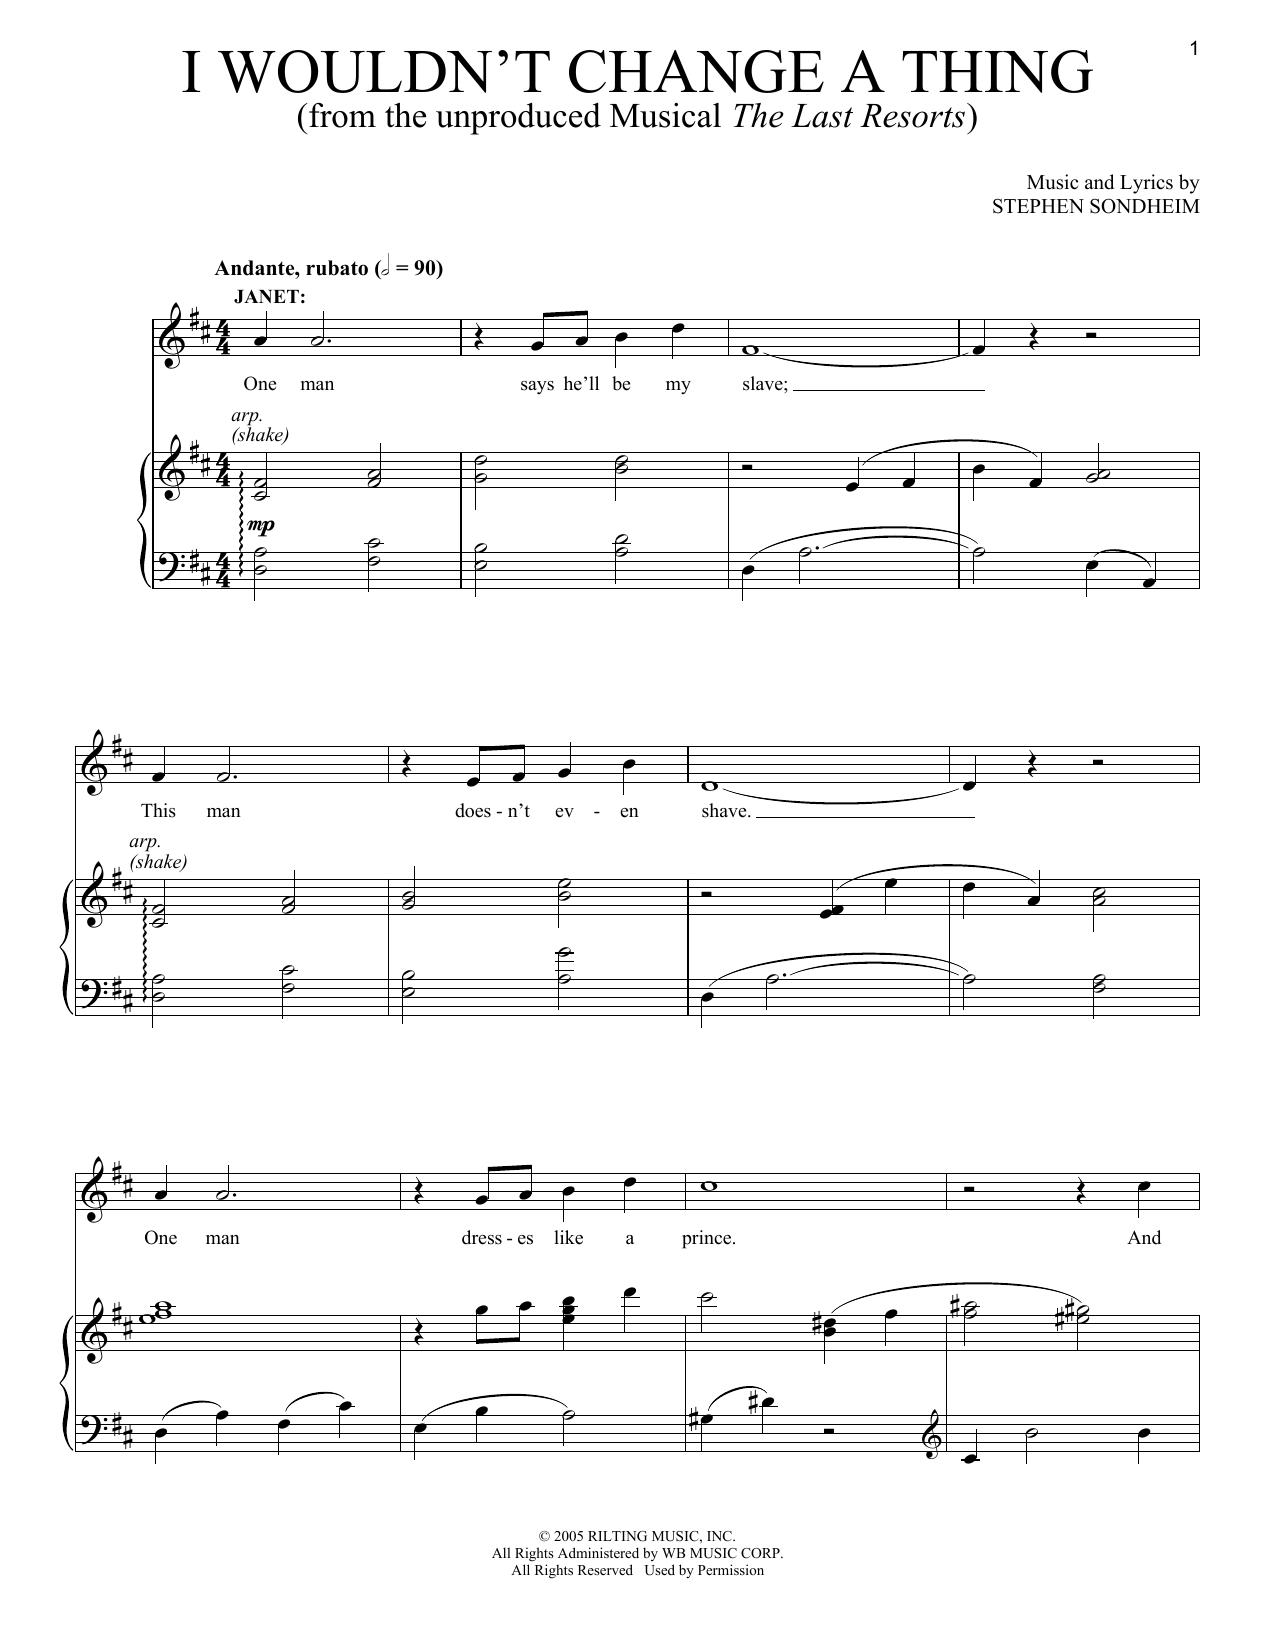 Stephen Sondheim - I Wouldn't Change A Thing